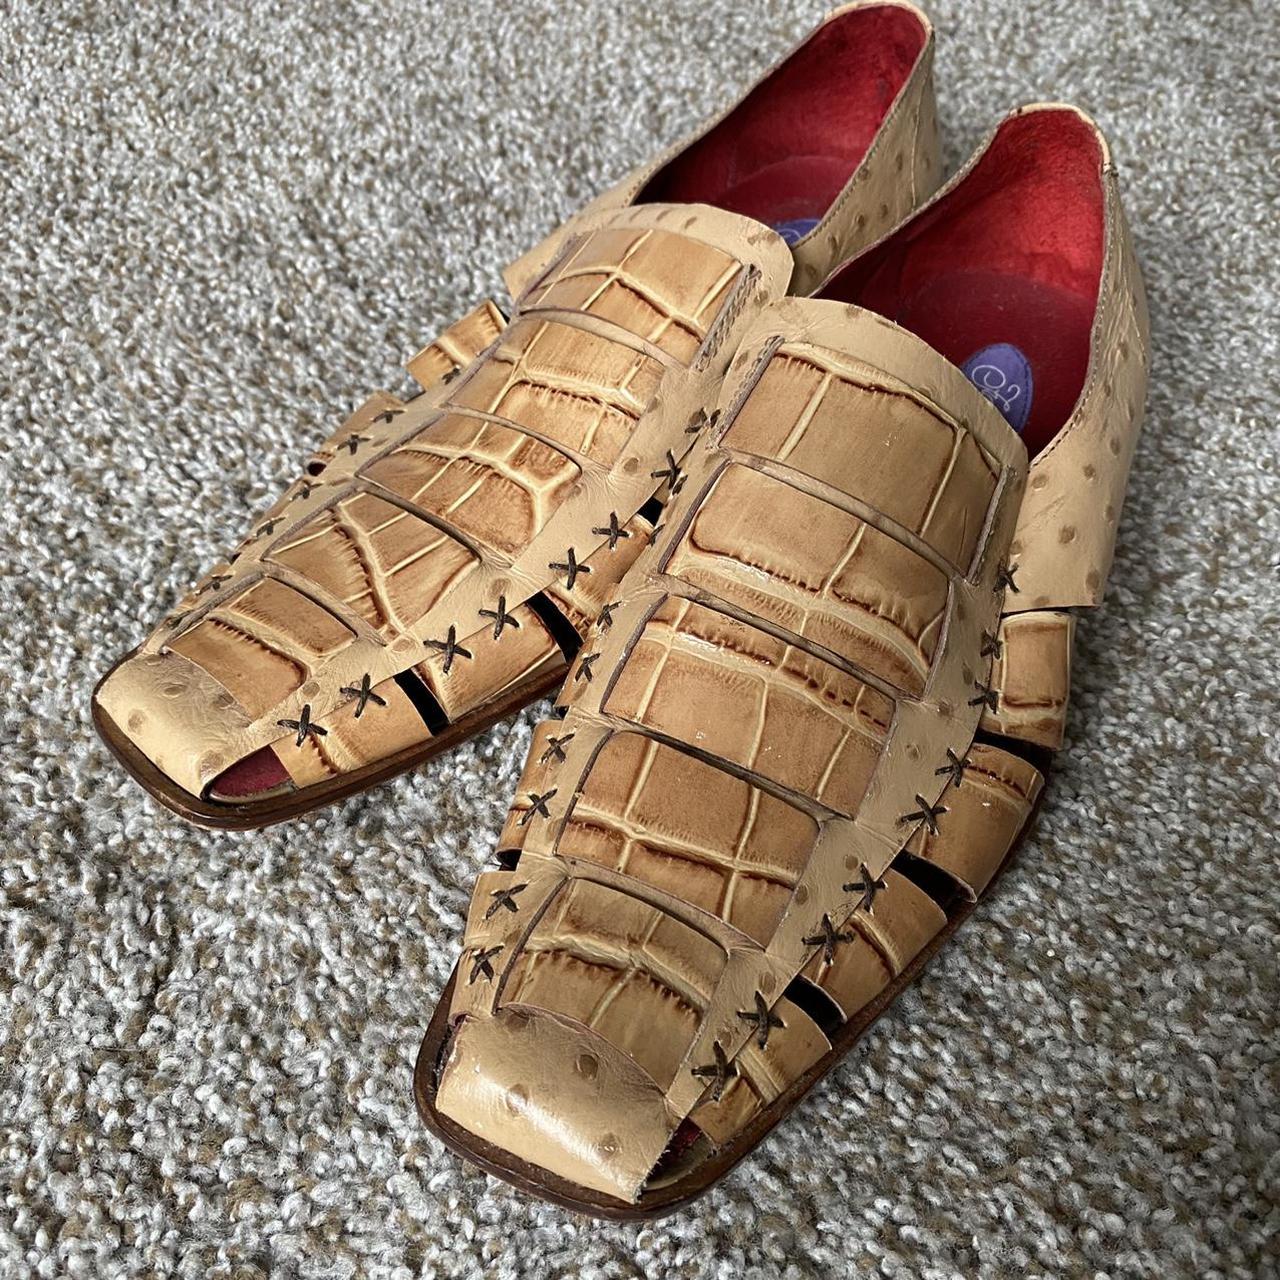 Product Image 1 - ✨ Vintage Fratelli loafers ✨ men's